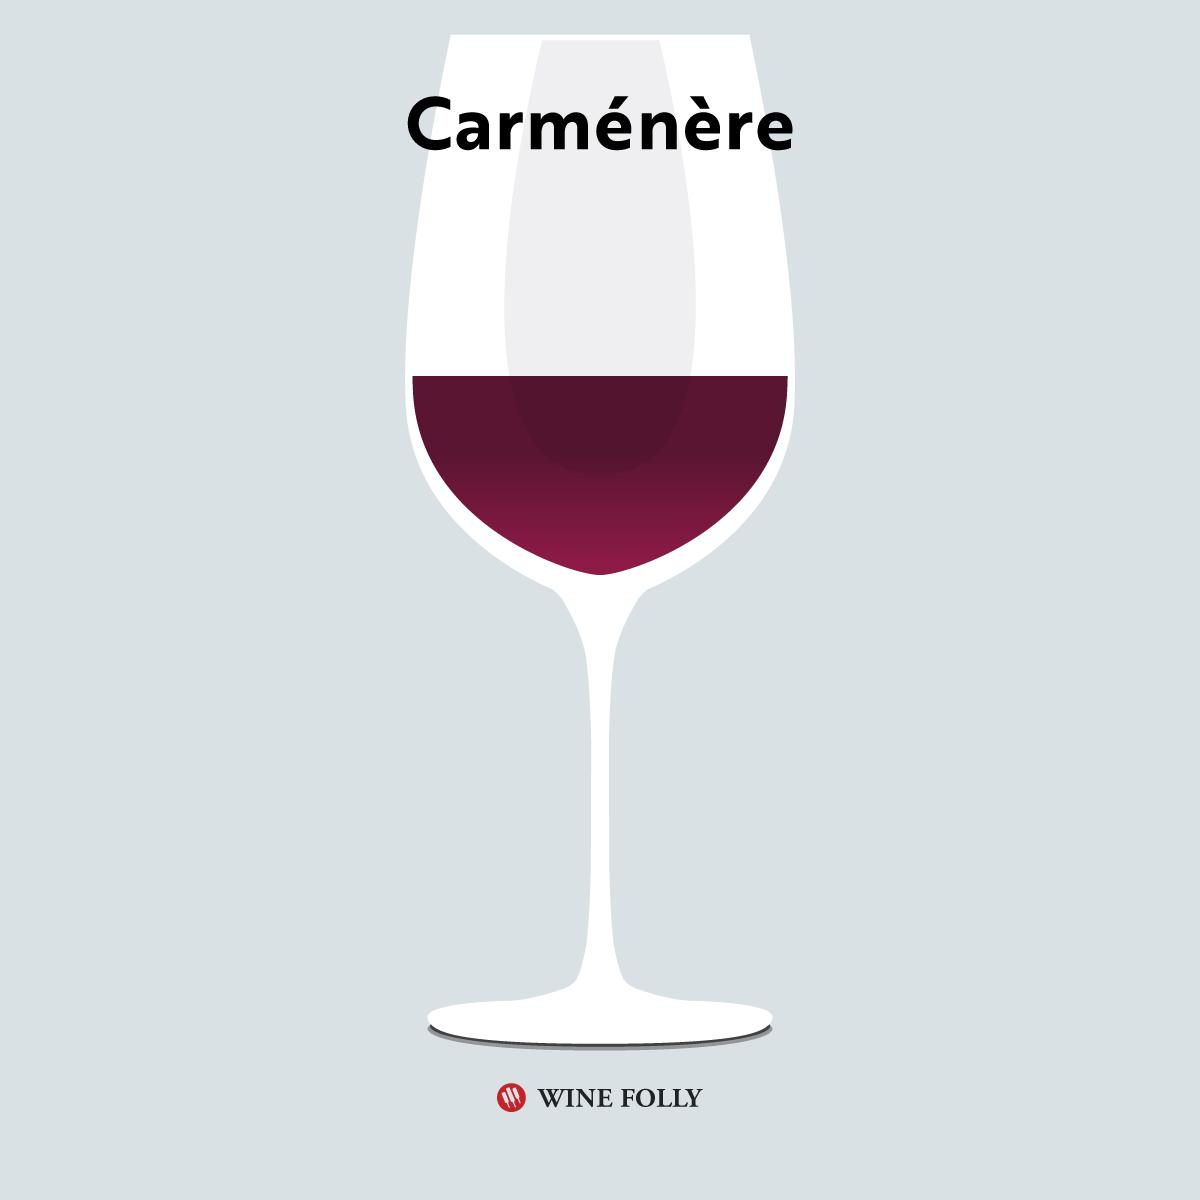 Carmenere in a glass - illustration by Wine Folly